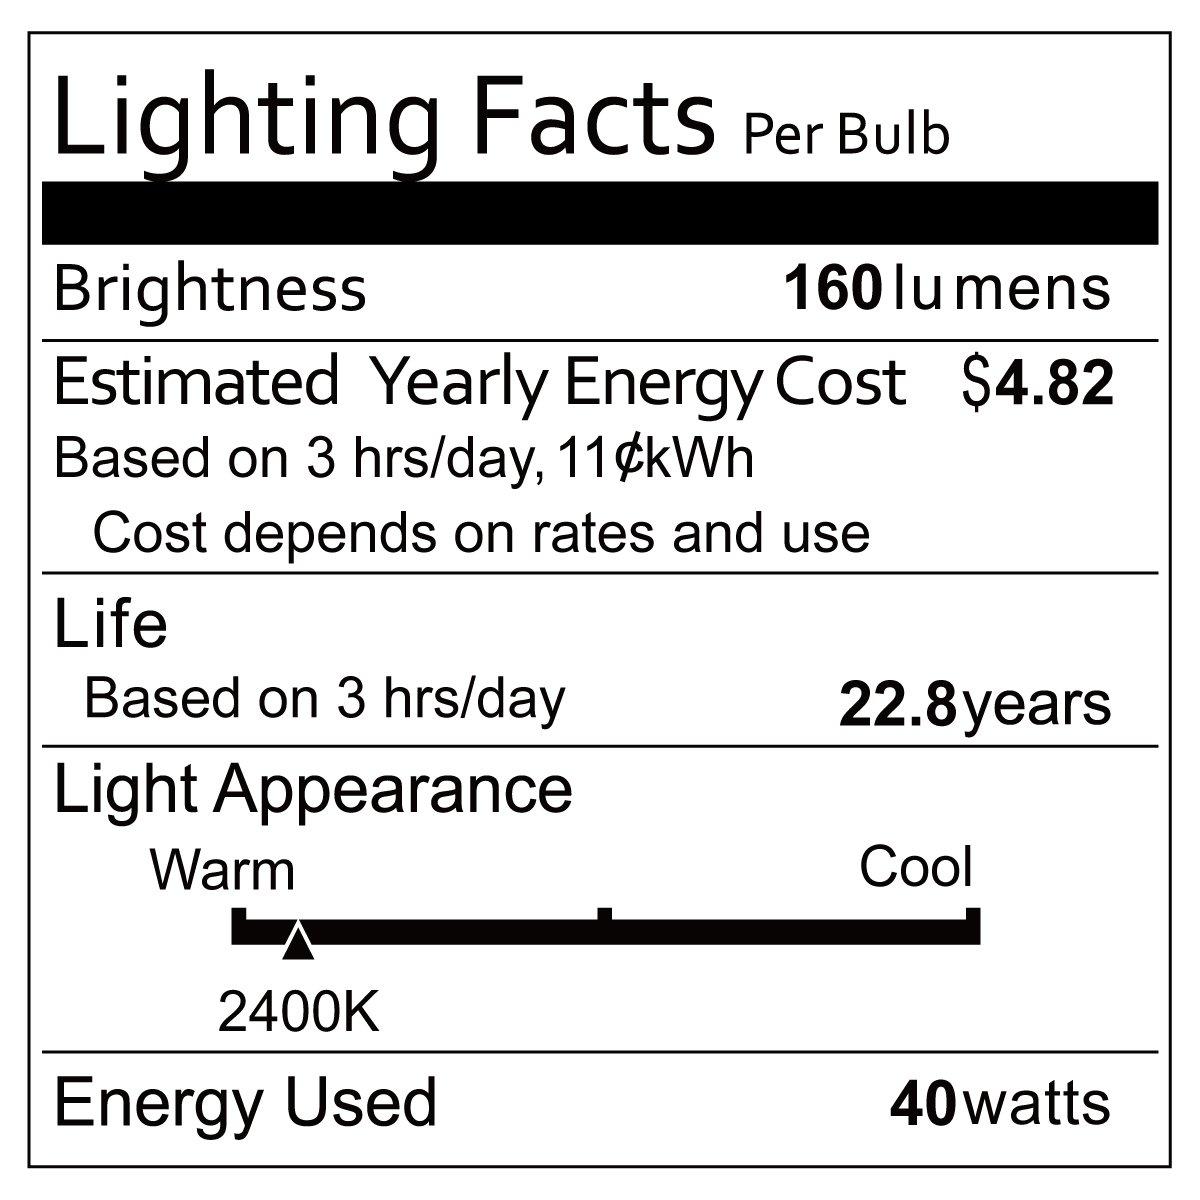 Oak Leaf Incandescent Light Bulbs 40 Watt, Amber Bulb 40W Edison Bulb Vintage Antique Filament Light Bulbs, 2400K Warm White(Amber Glow),Medium Screw Base E26,6 Pack by Oak Leaf (Image #2)